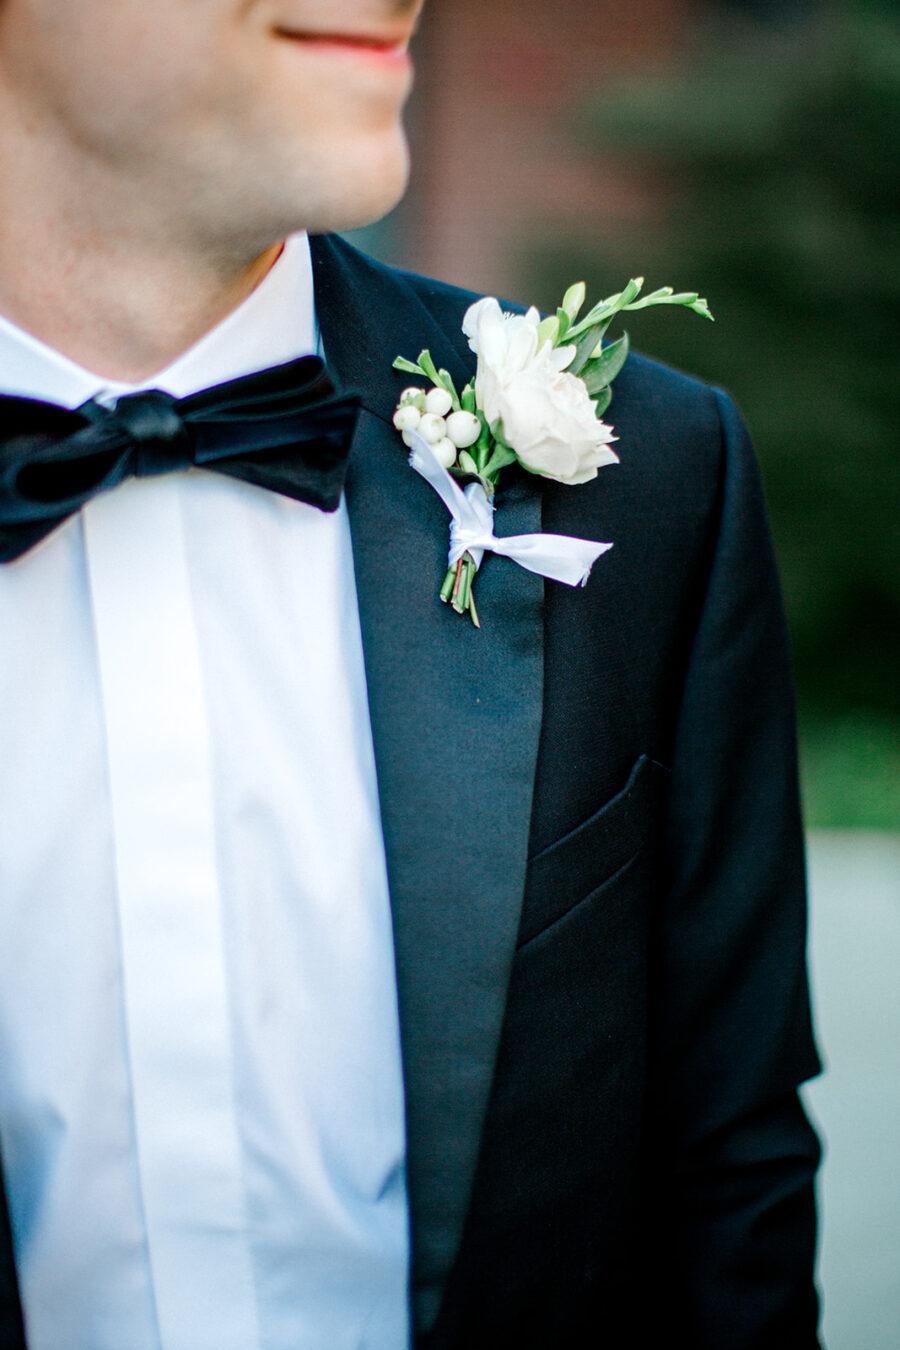 White and greenery wedding boutonniere